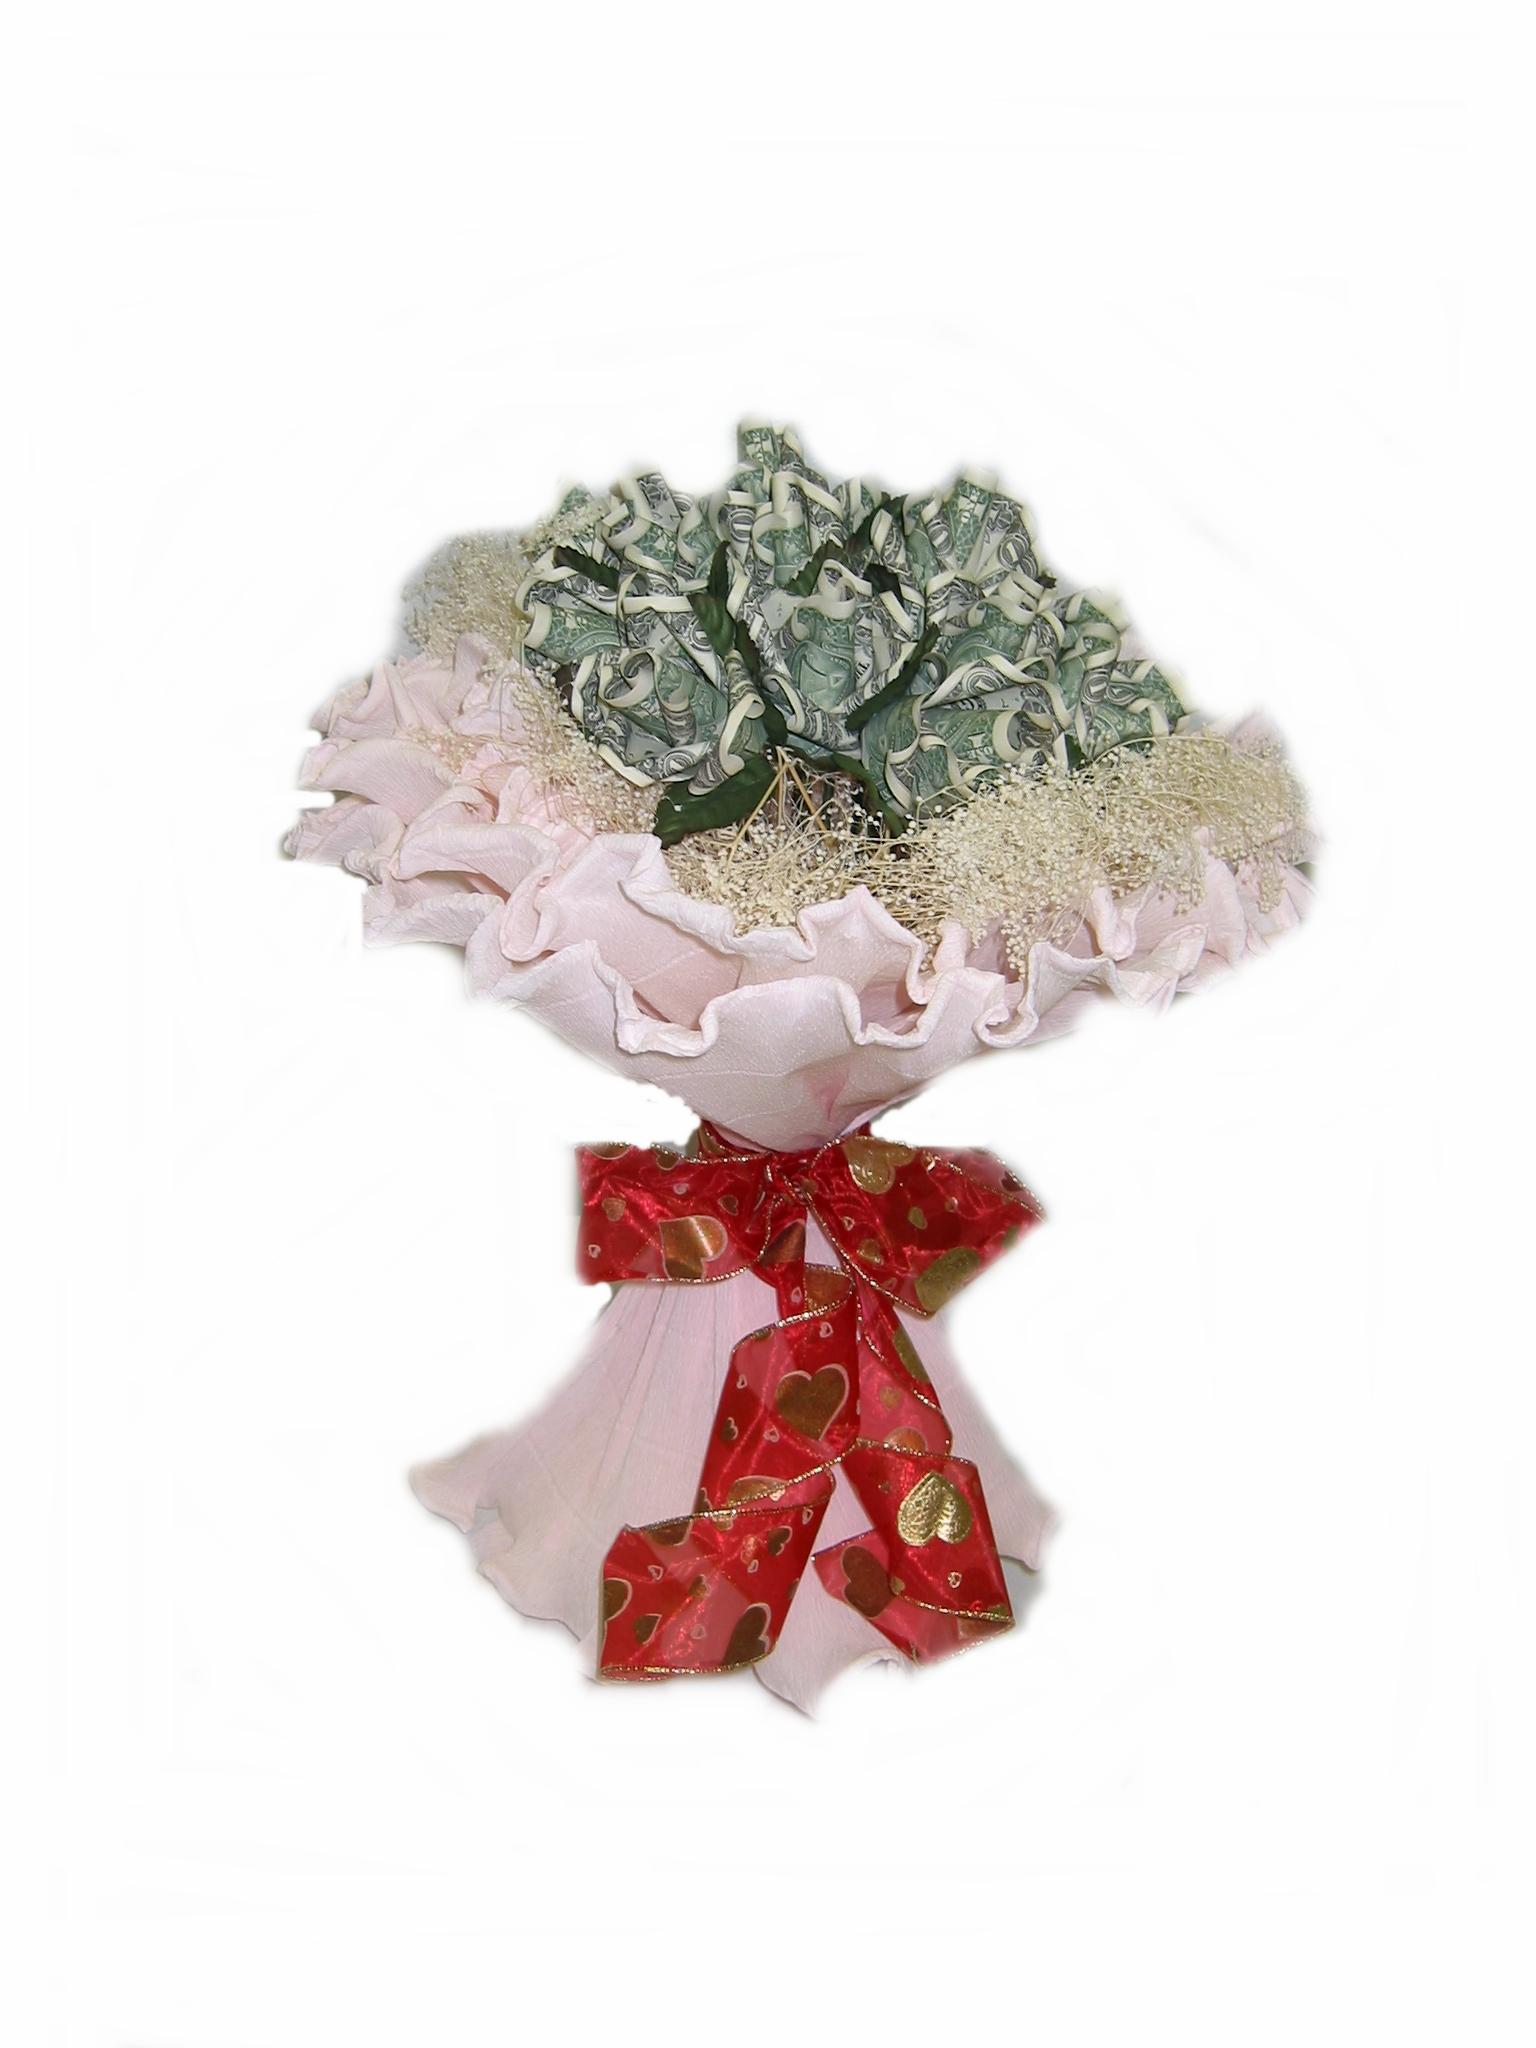 profruit shop,Money flower,Bouquet,Money Cake,Quinsanera